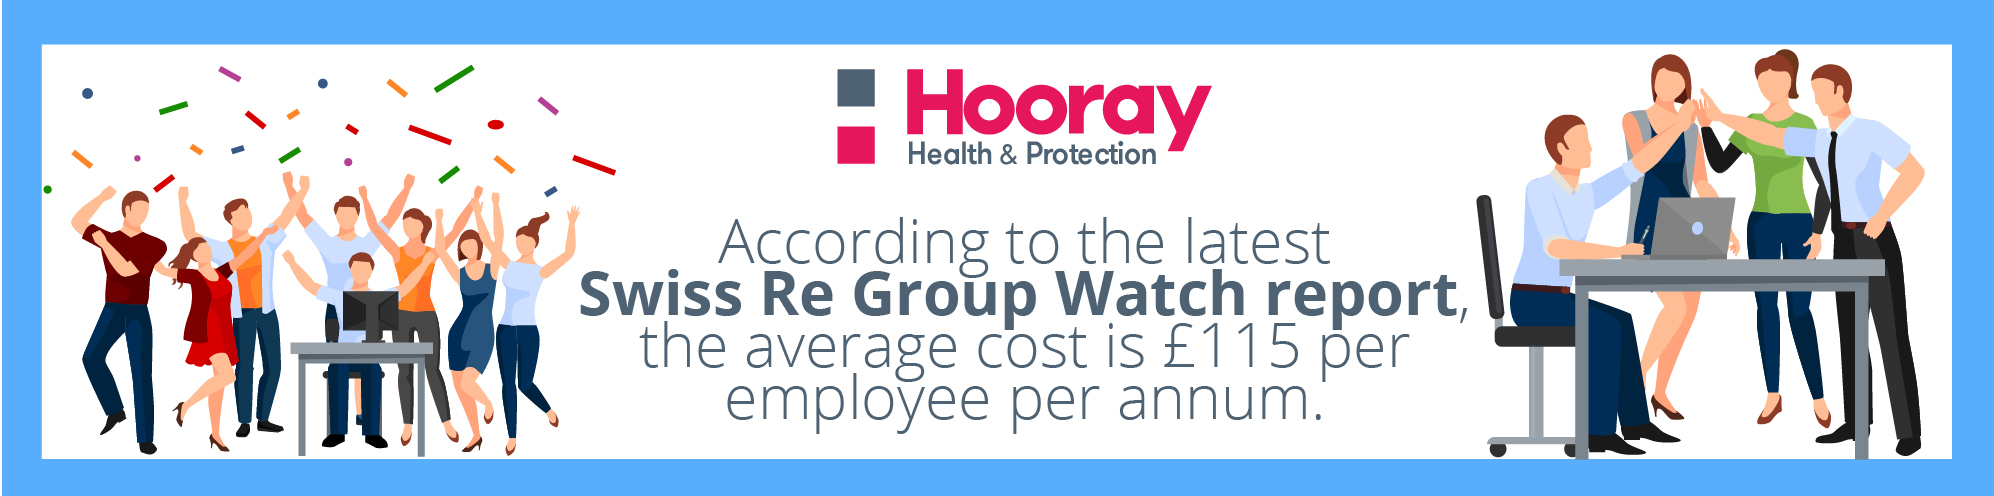 Employee Life Insurance Fact